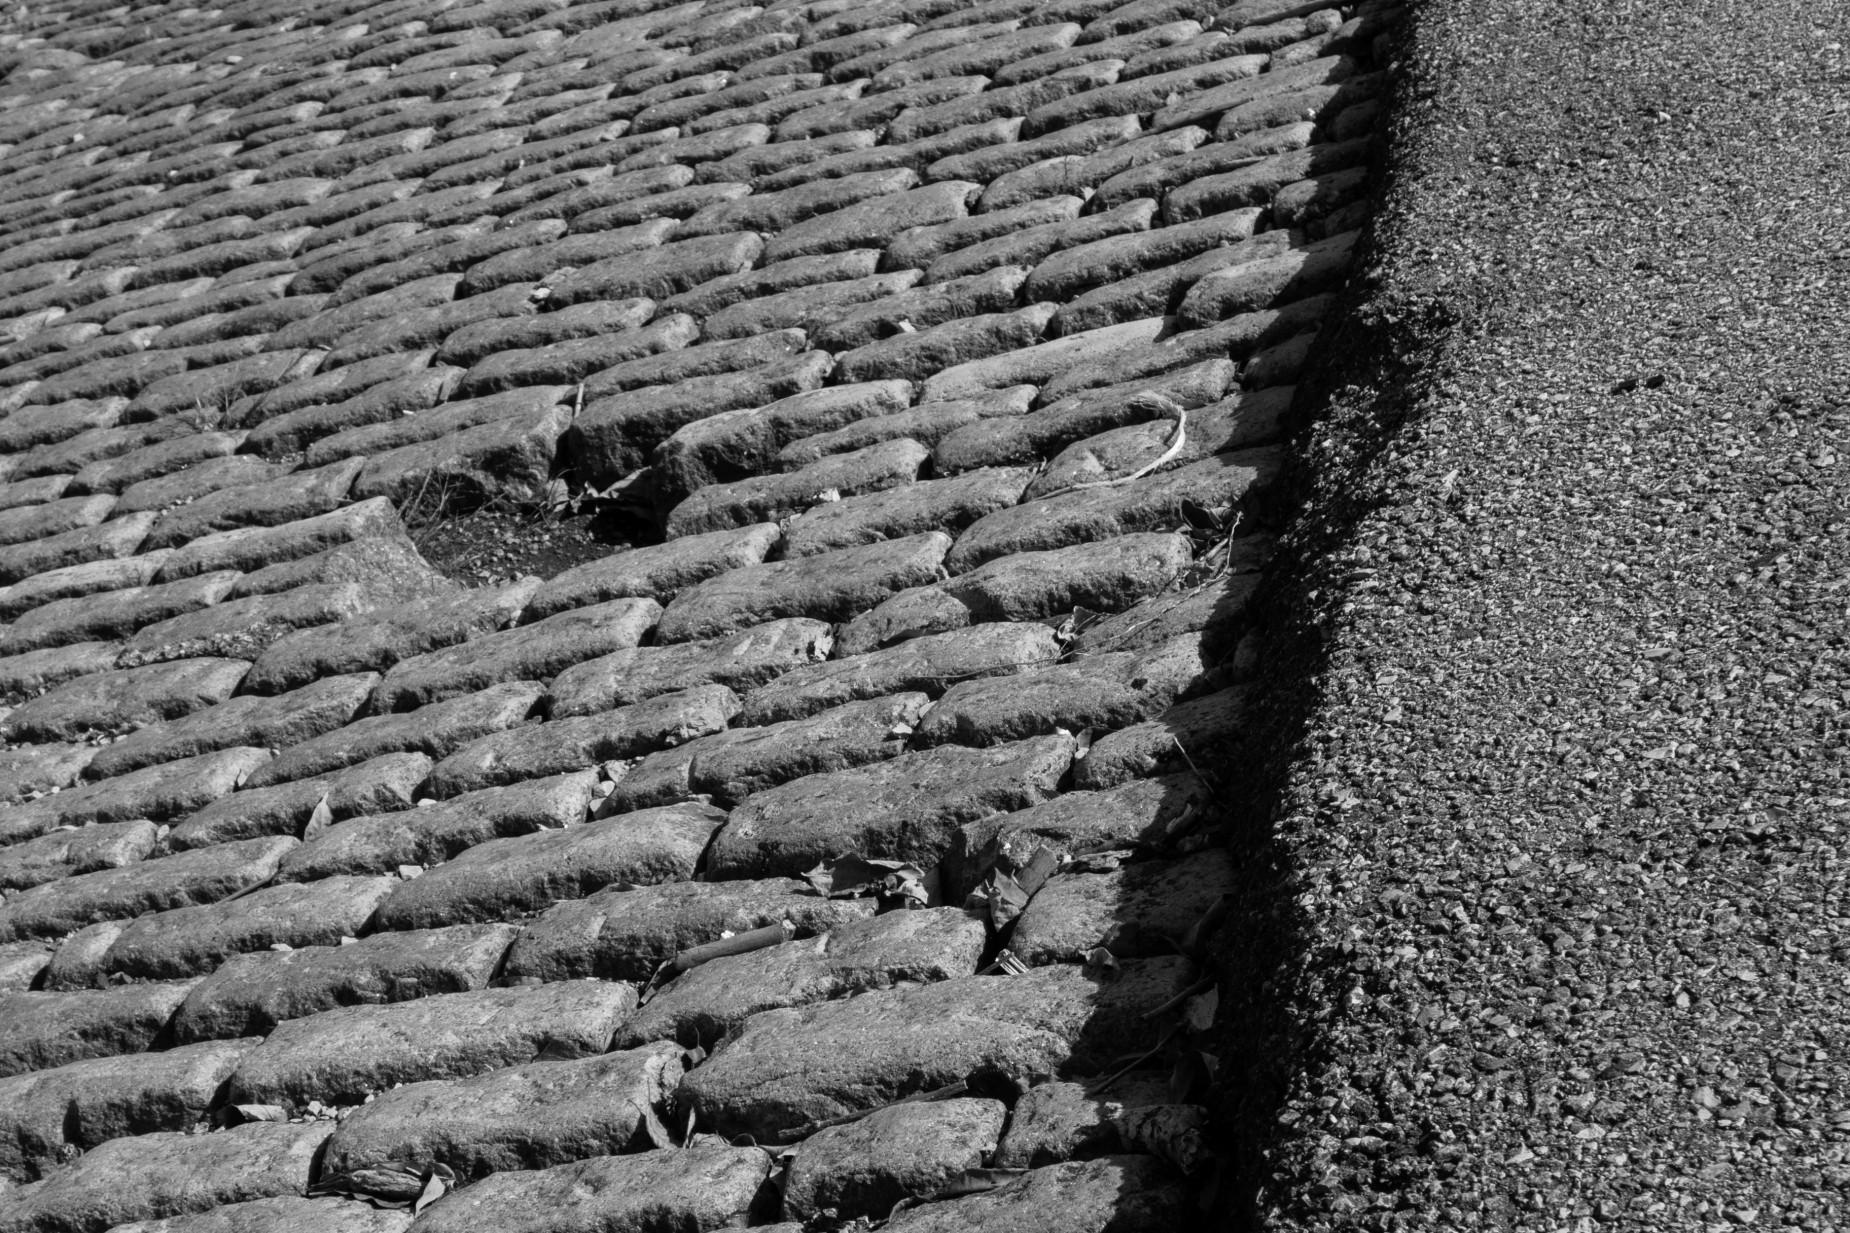 St-Louis-Bicycling-Riverview-Trail-5-1850x1233.jpg